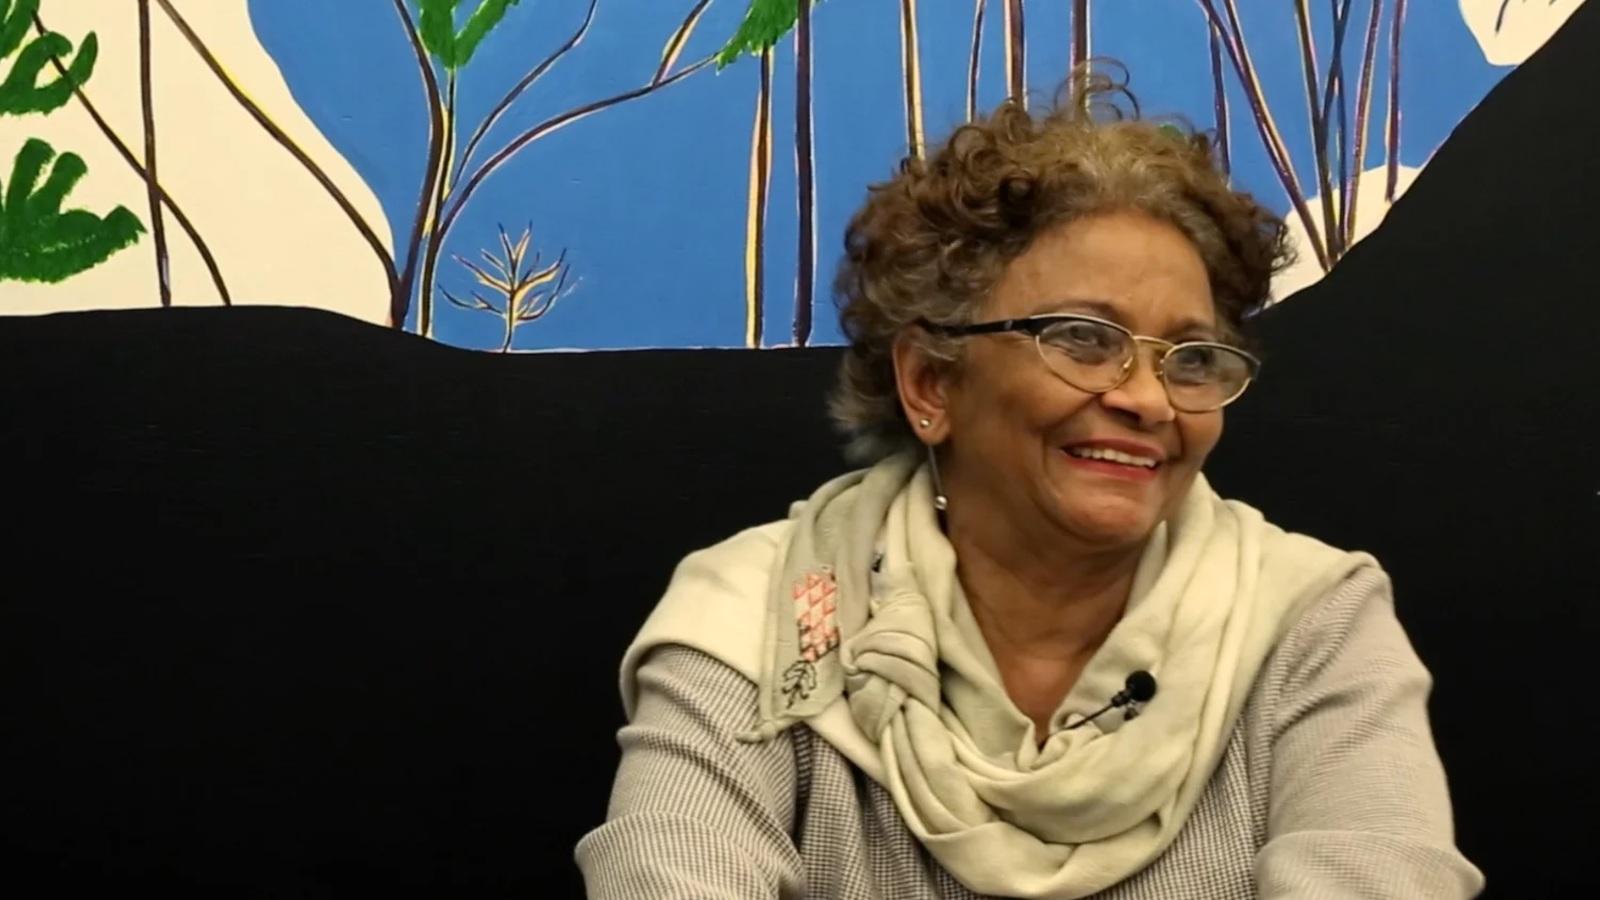 Sonia Gomes